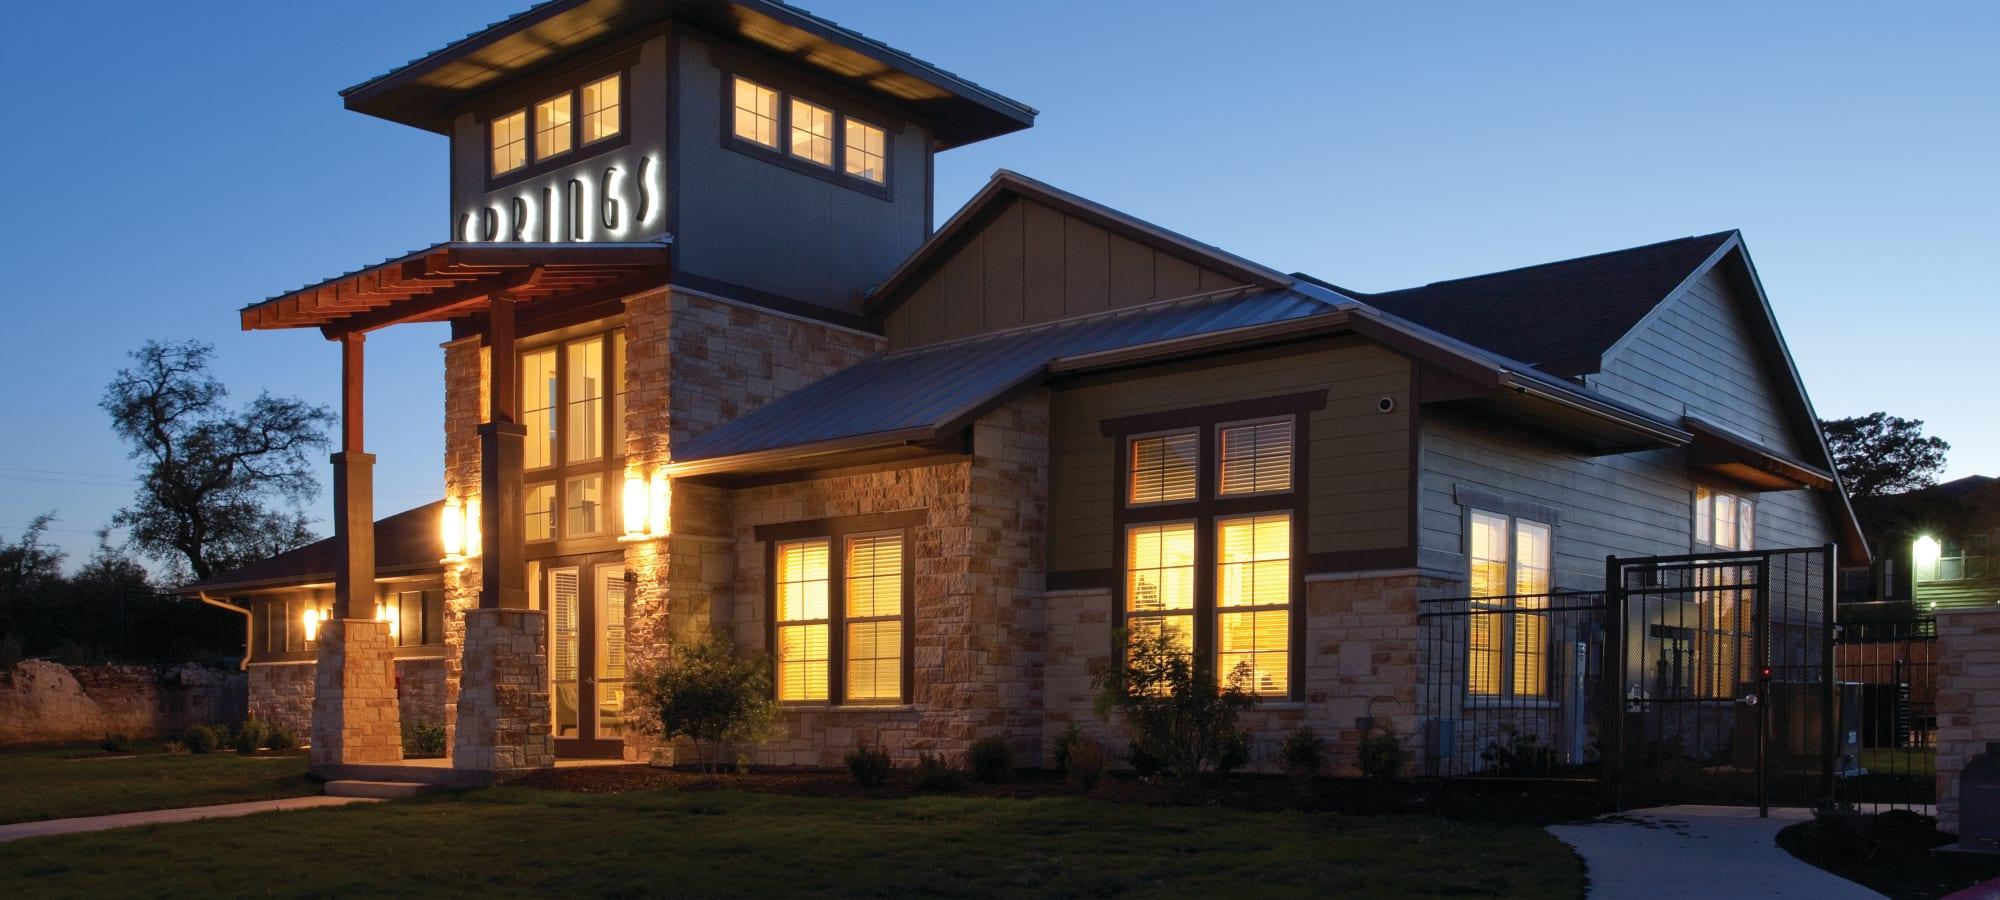 Townhome  Style Apartments in San Antonio, TX